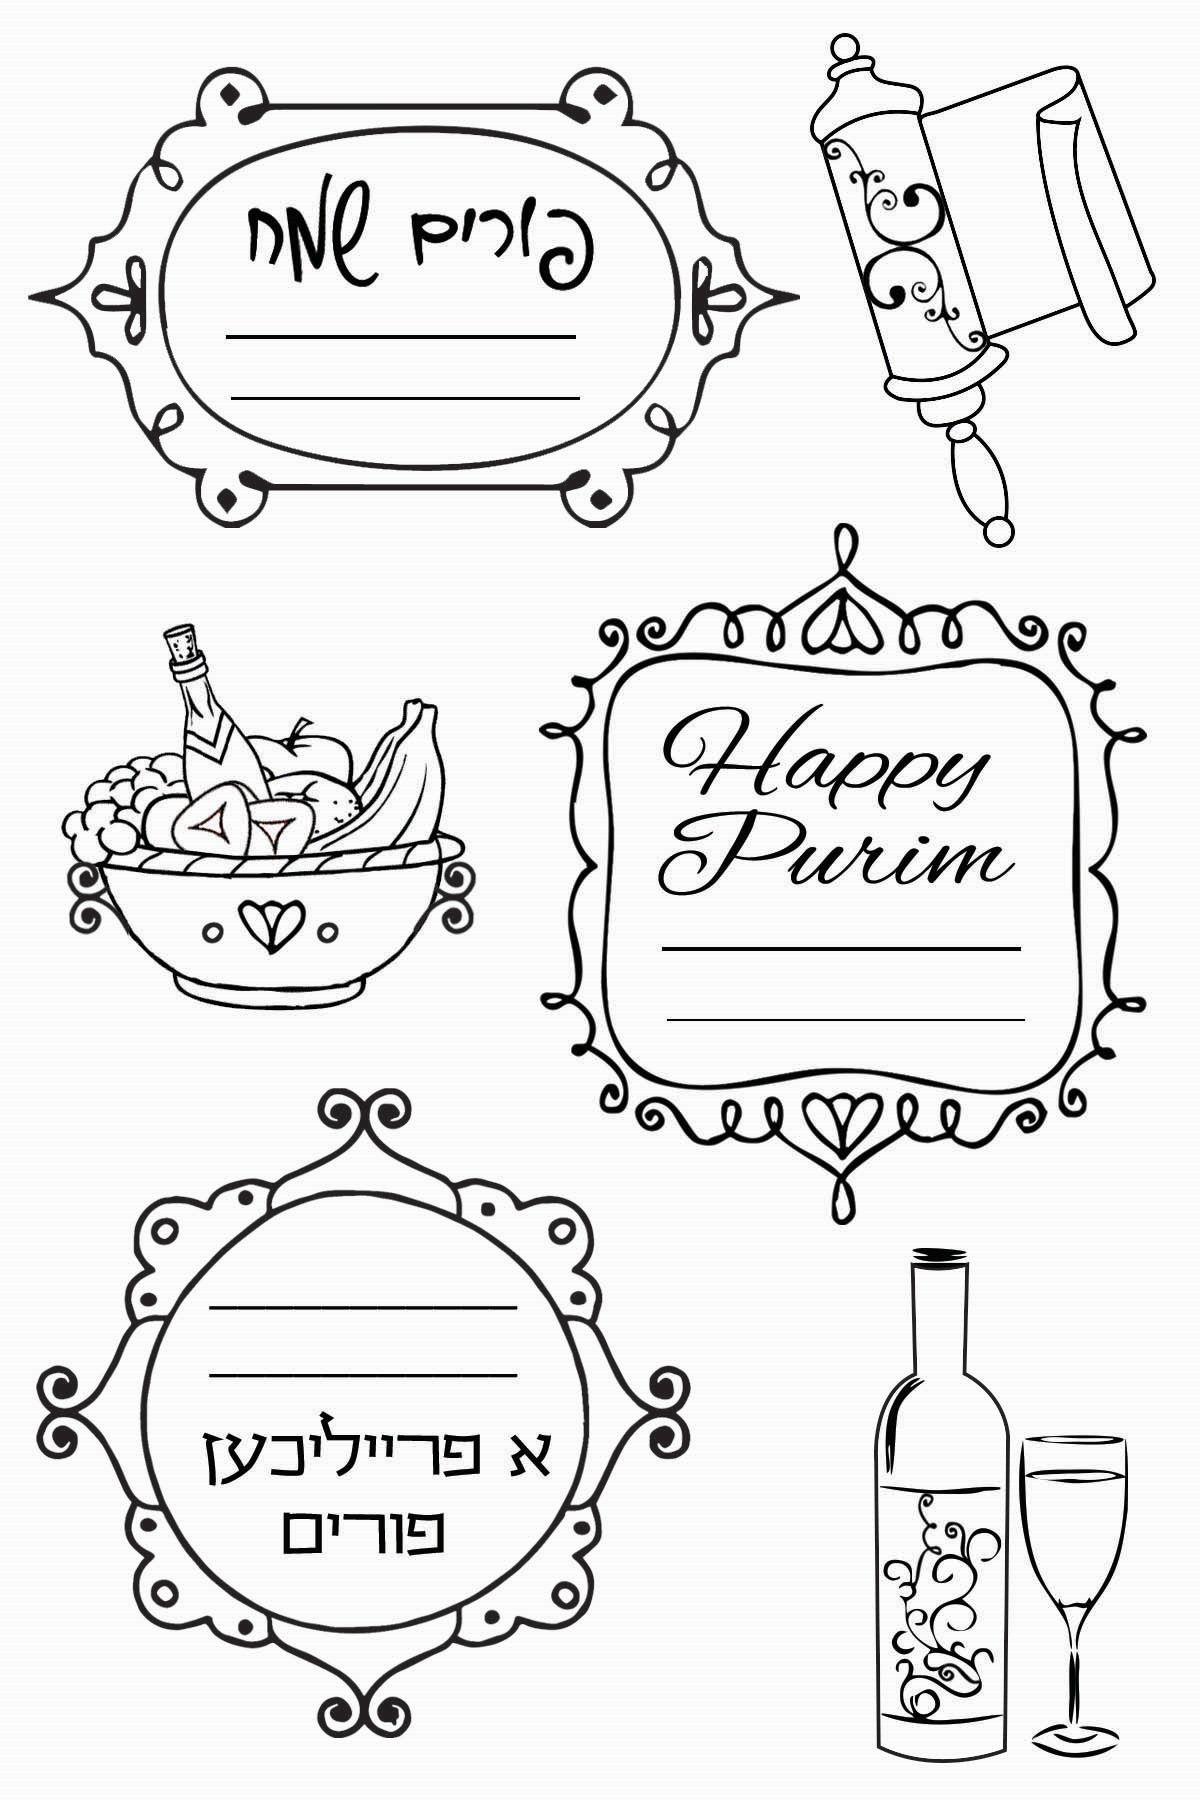 Purim Fun Jewish clear stamp crafting collection www